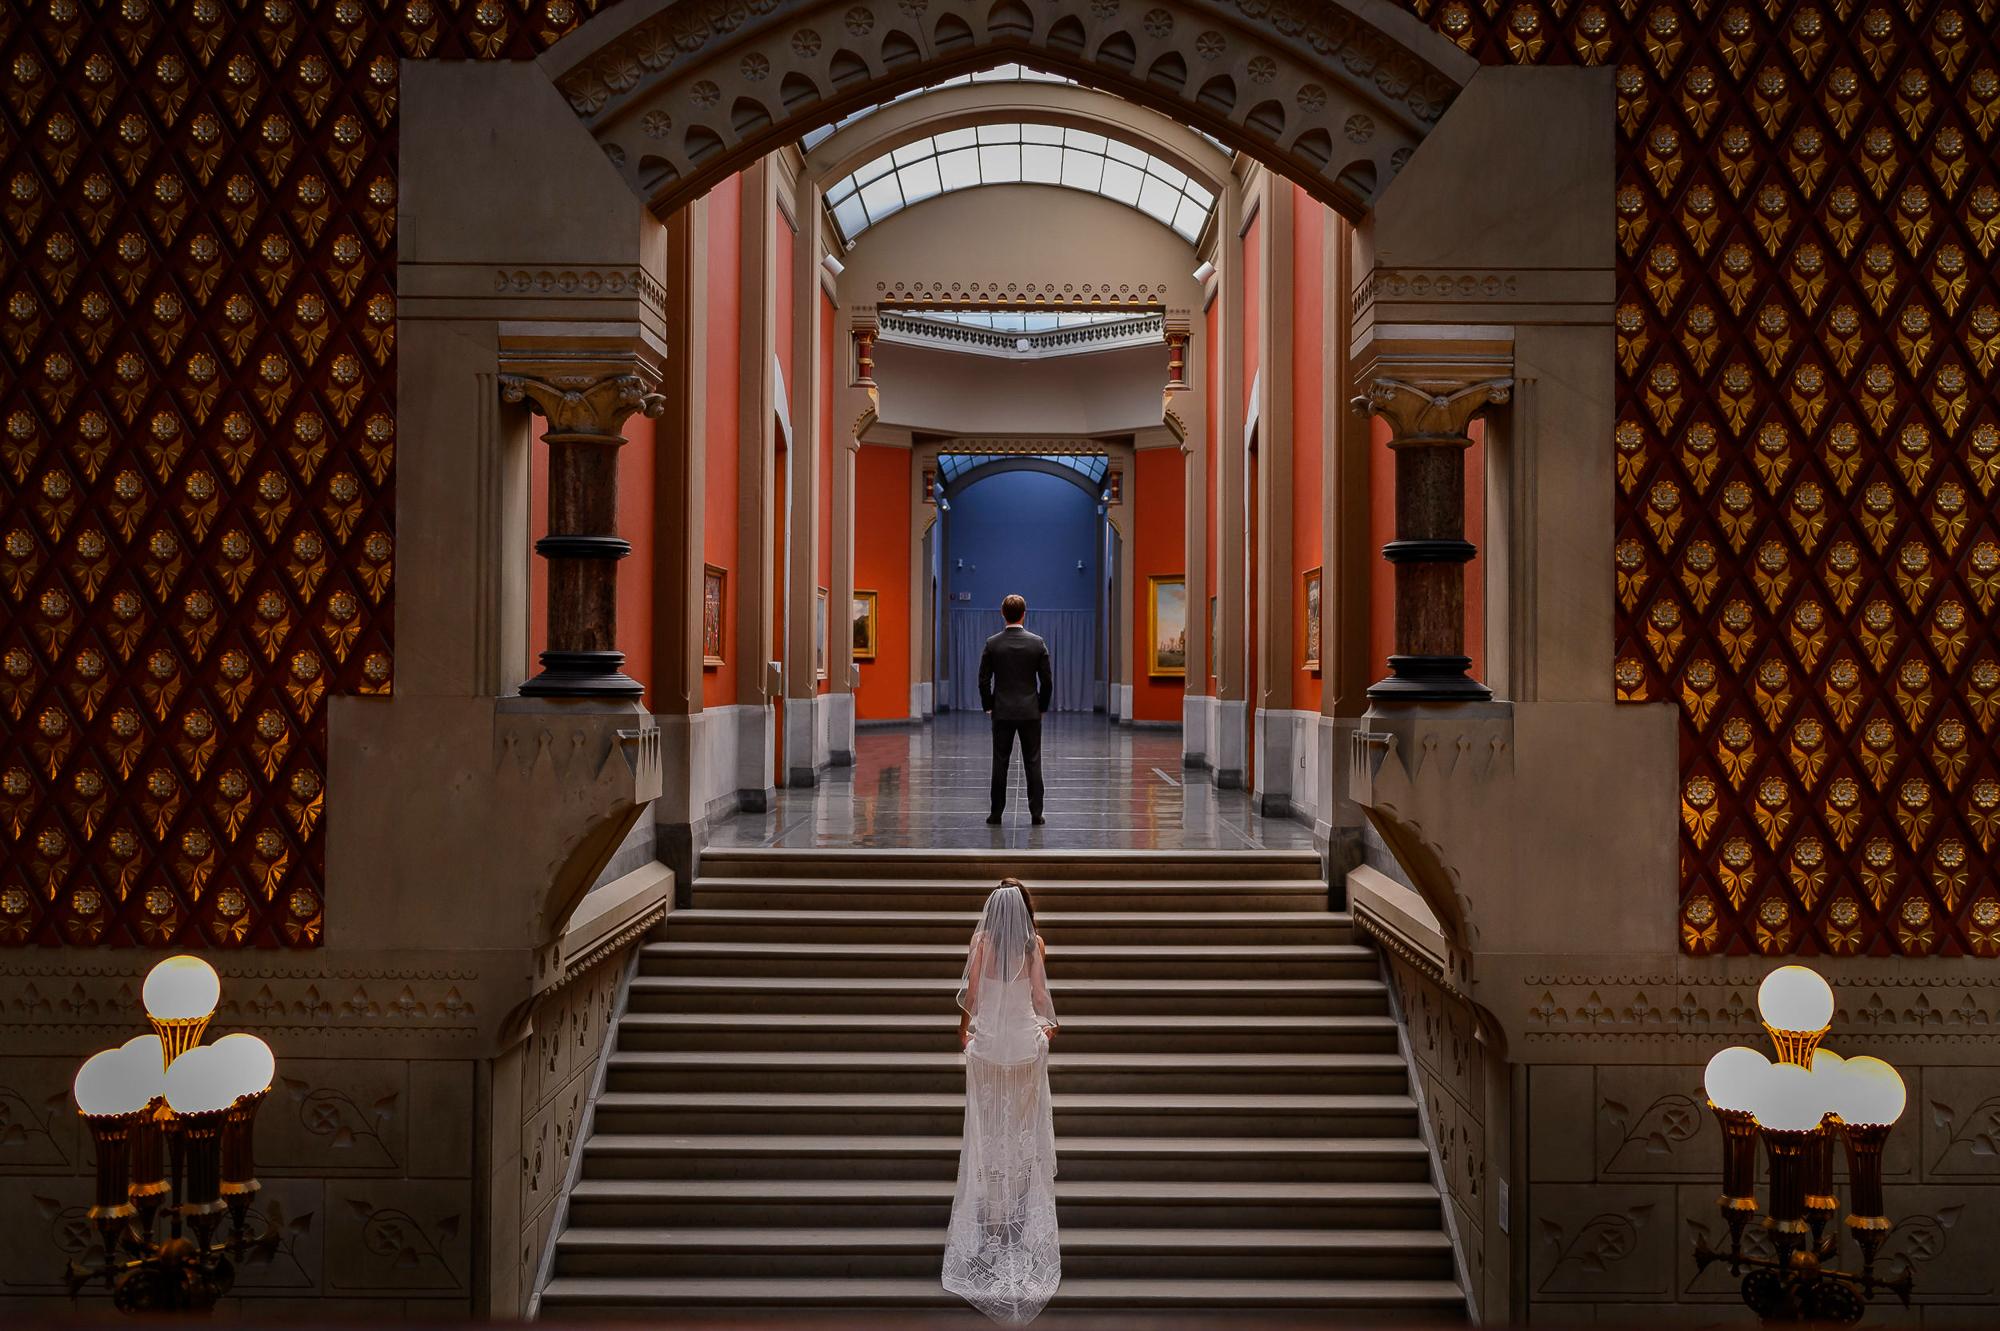 bride-ascends-stairs-at-philadelphia-art-museum-to-meet-groom-christopher-jason-studios